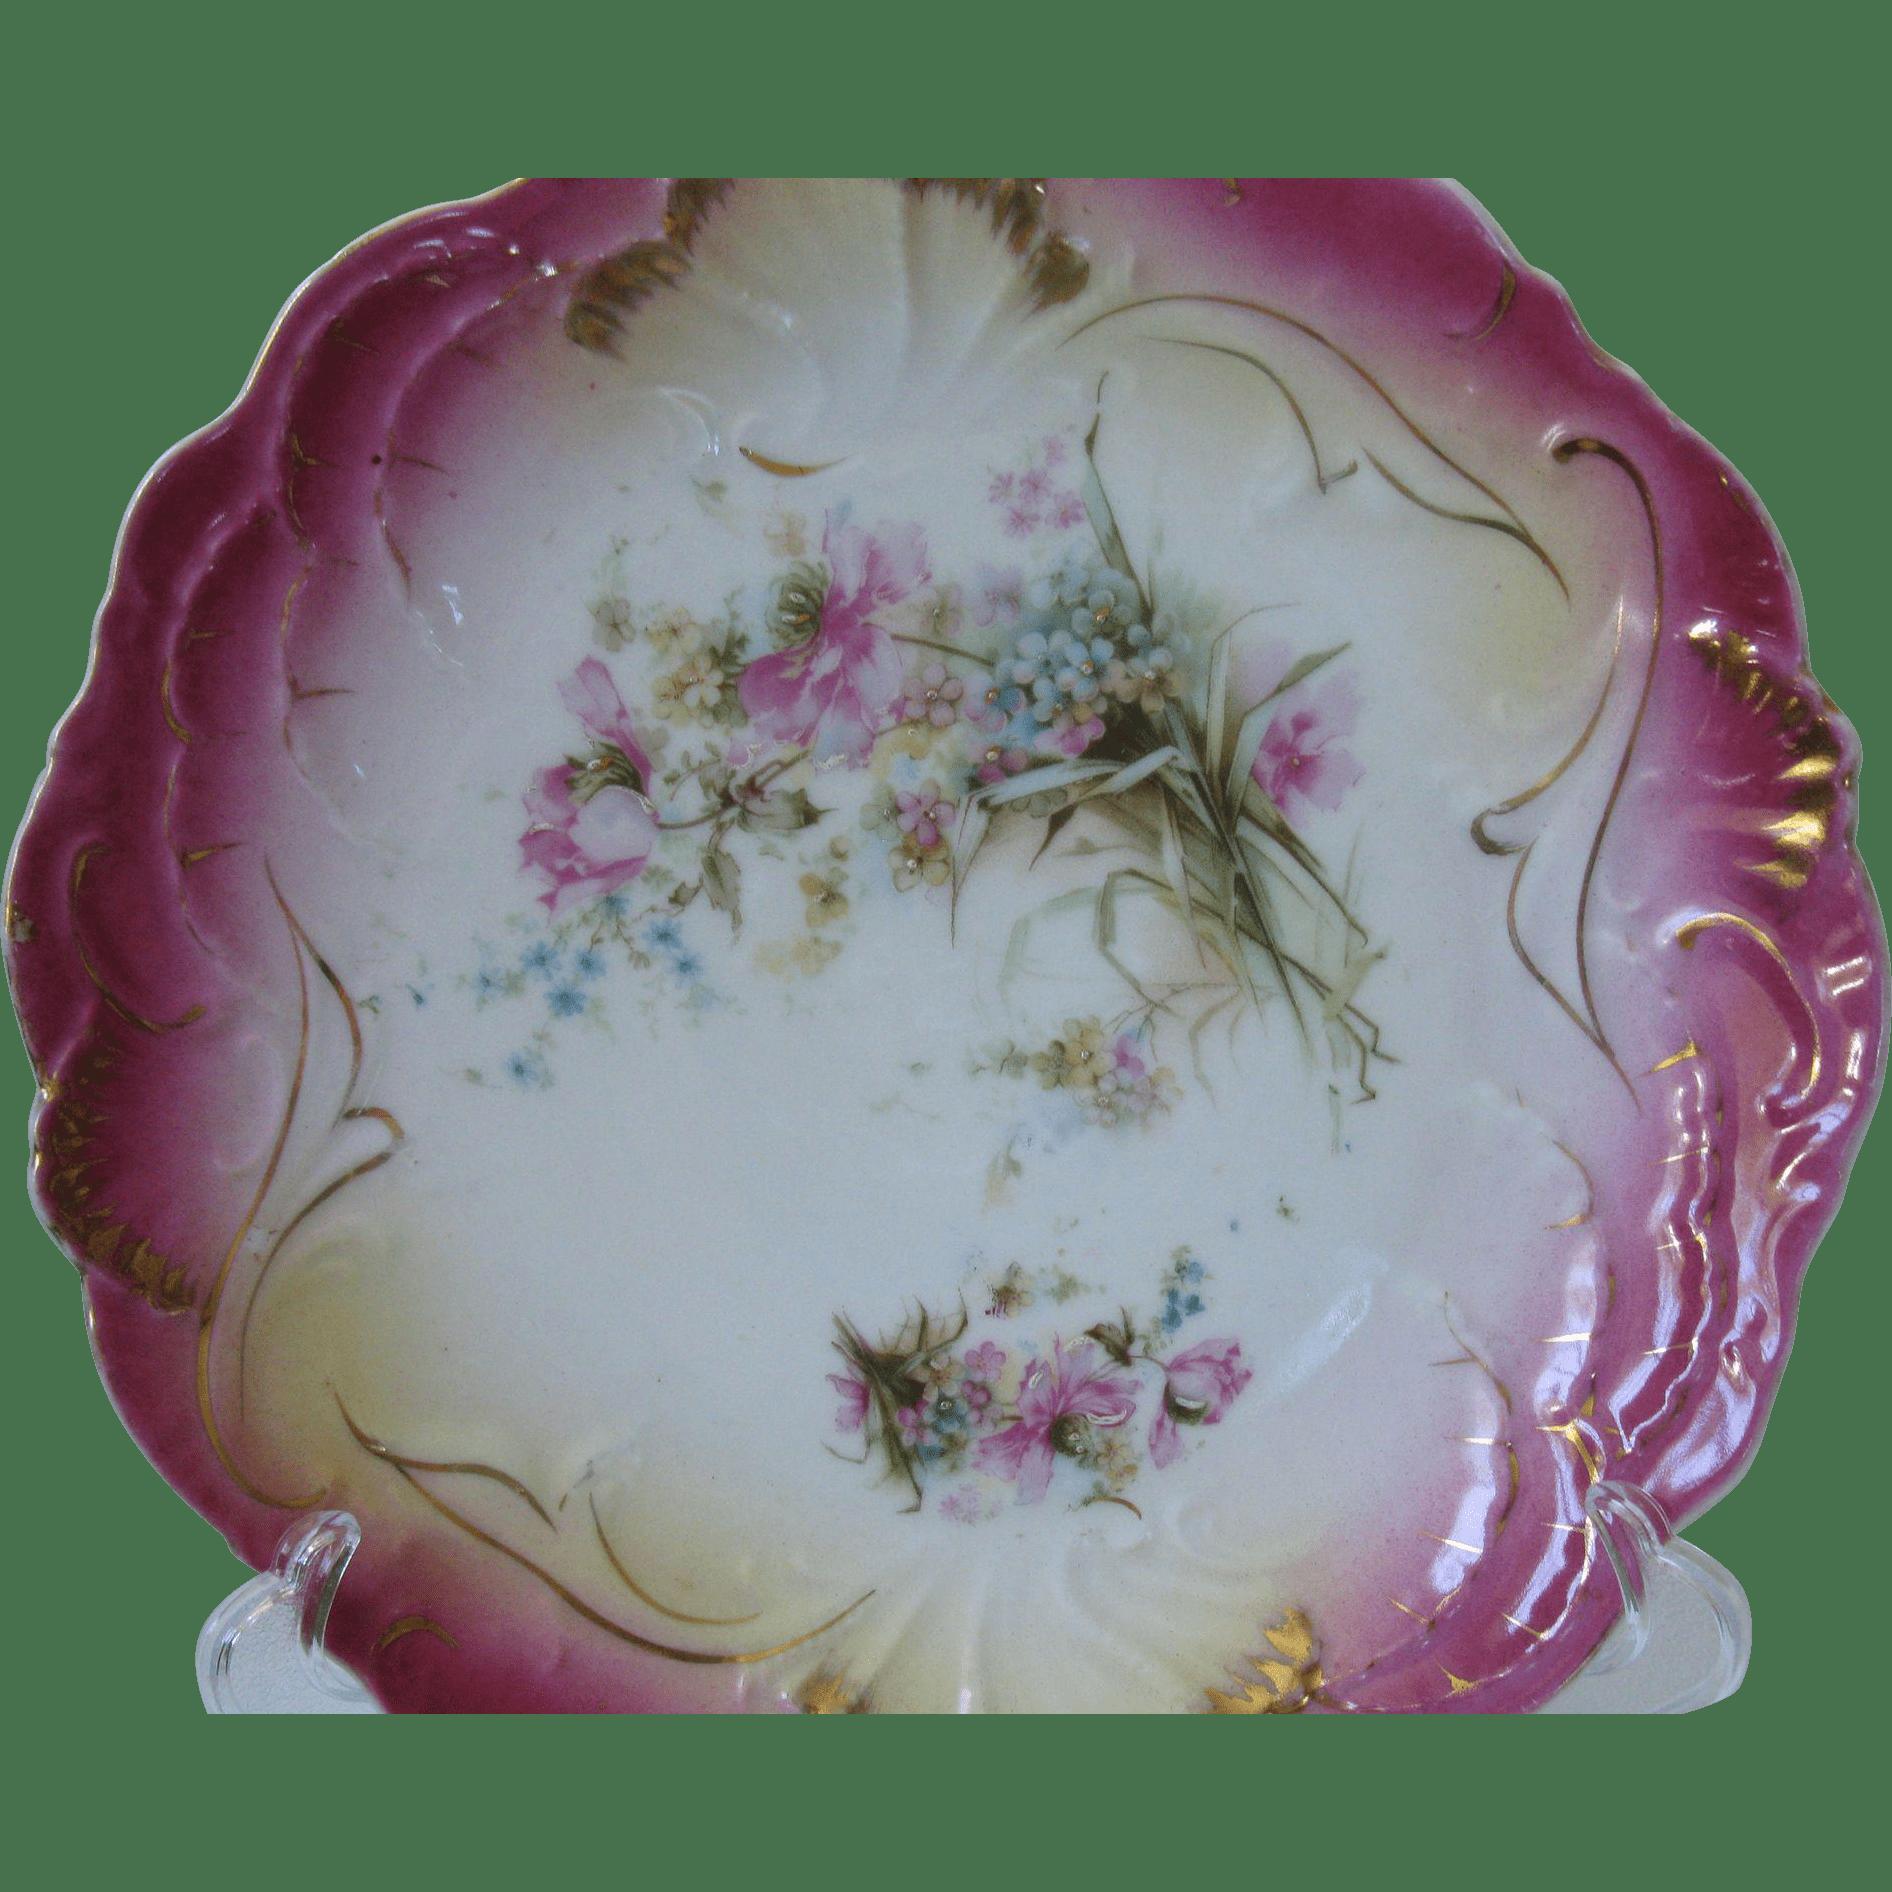 Very Rare Antique Hand Painted Porcelain Bavarian Cake